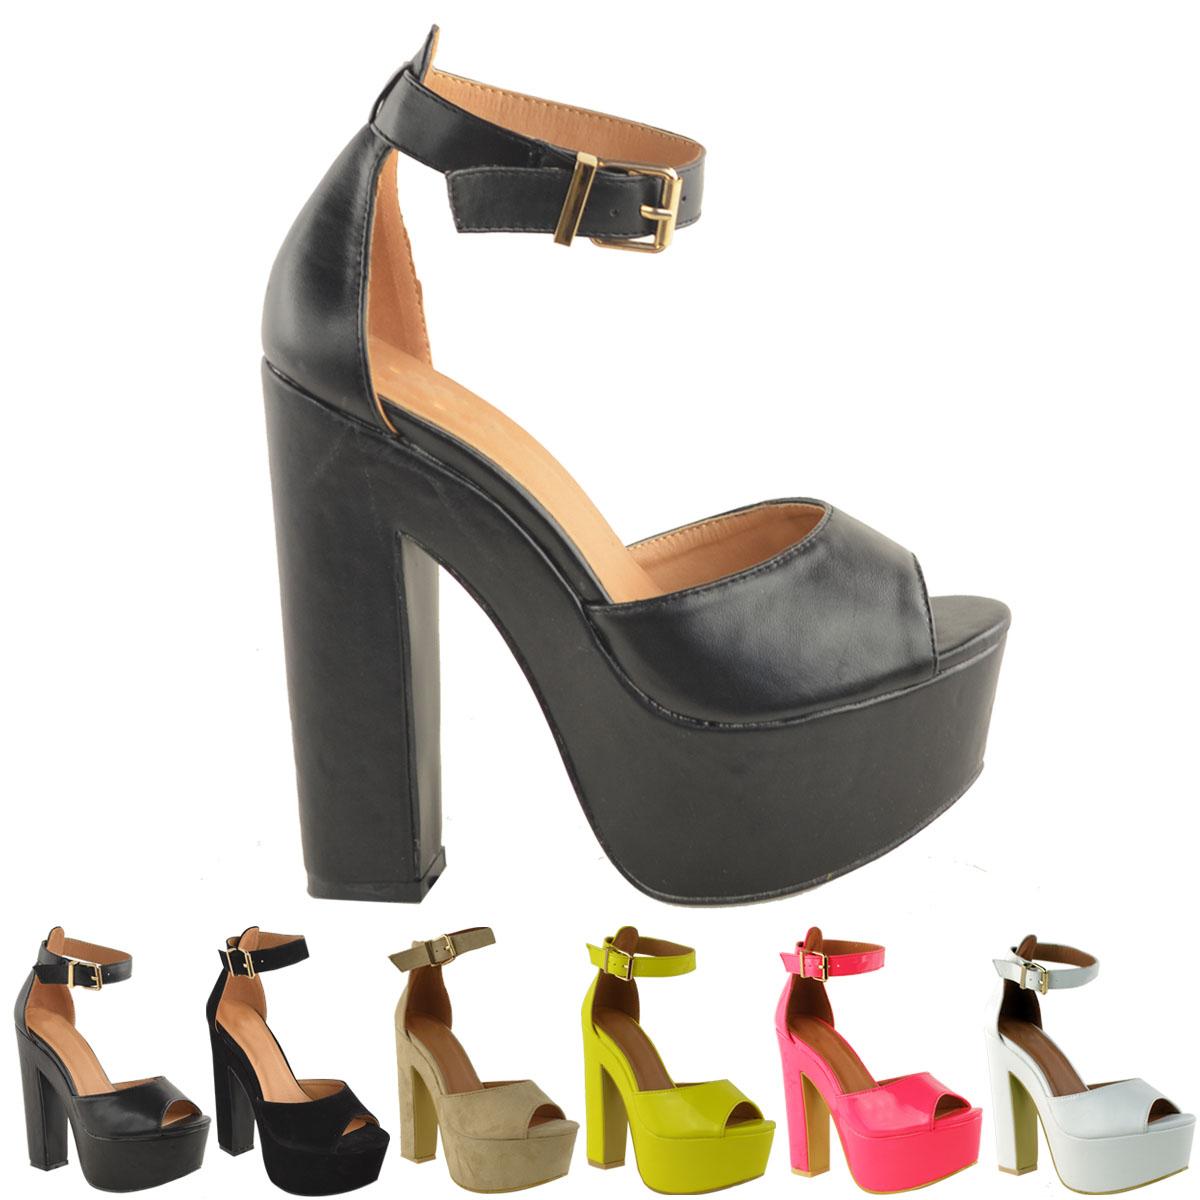 Scarpe Tacco Grosso Ebay